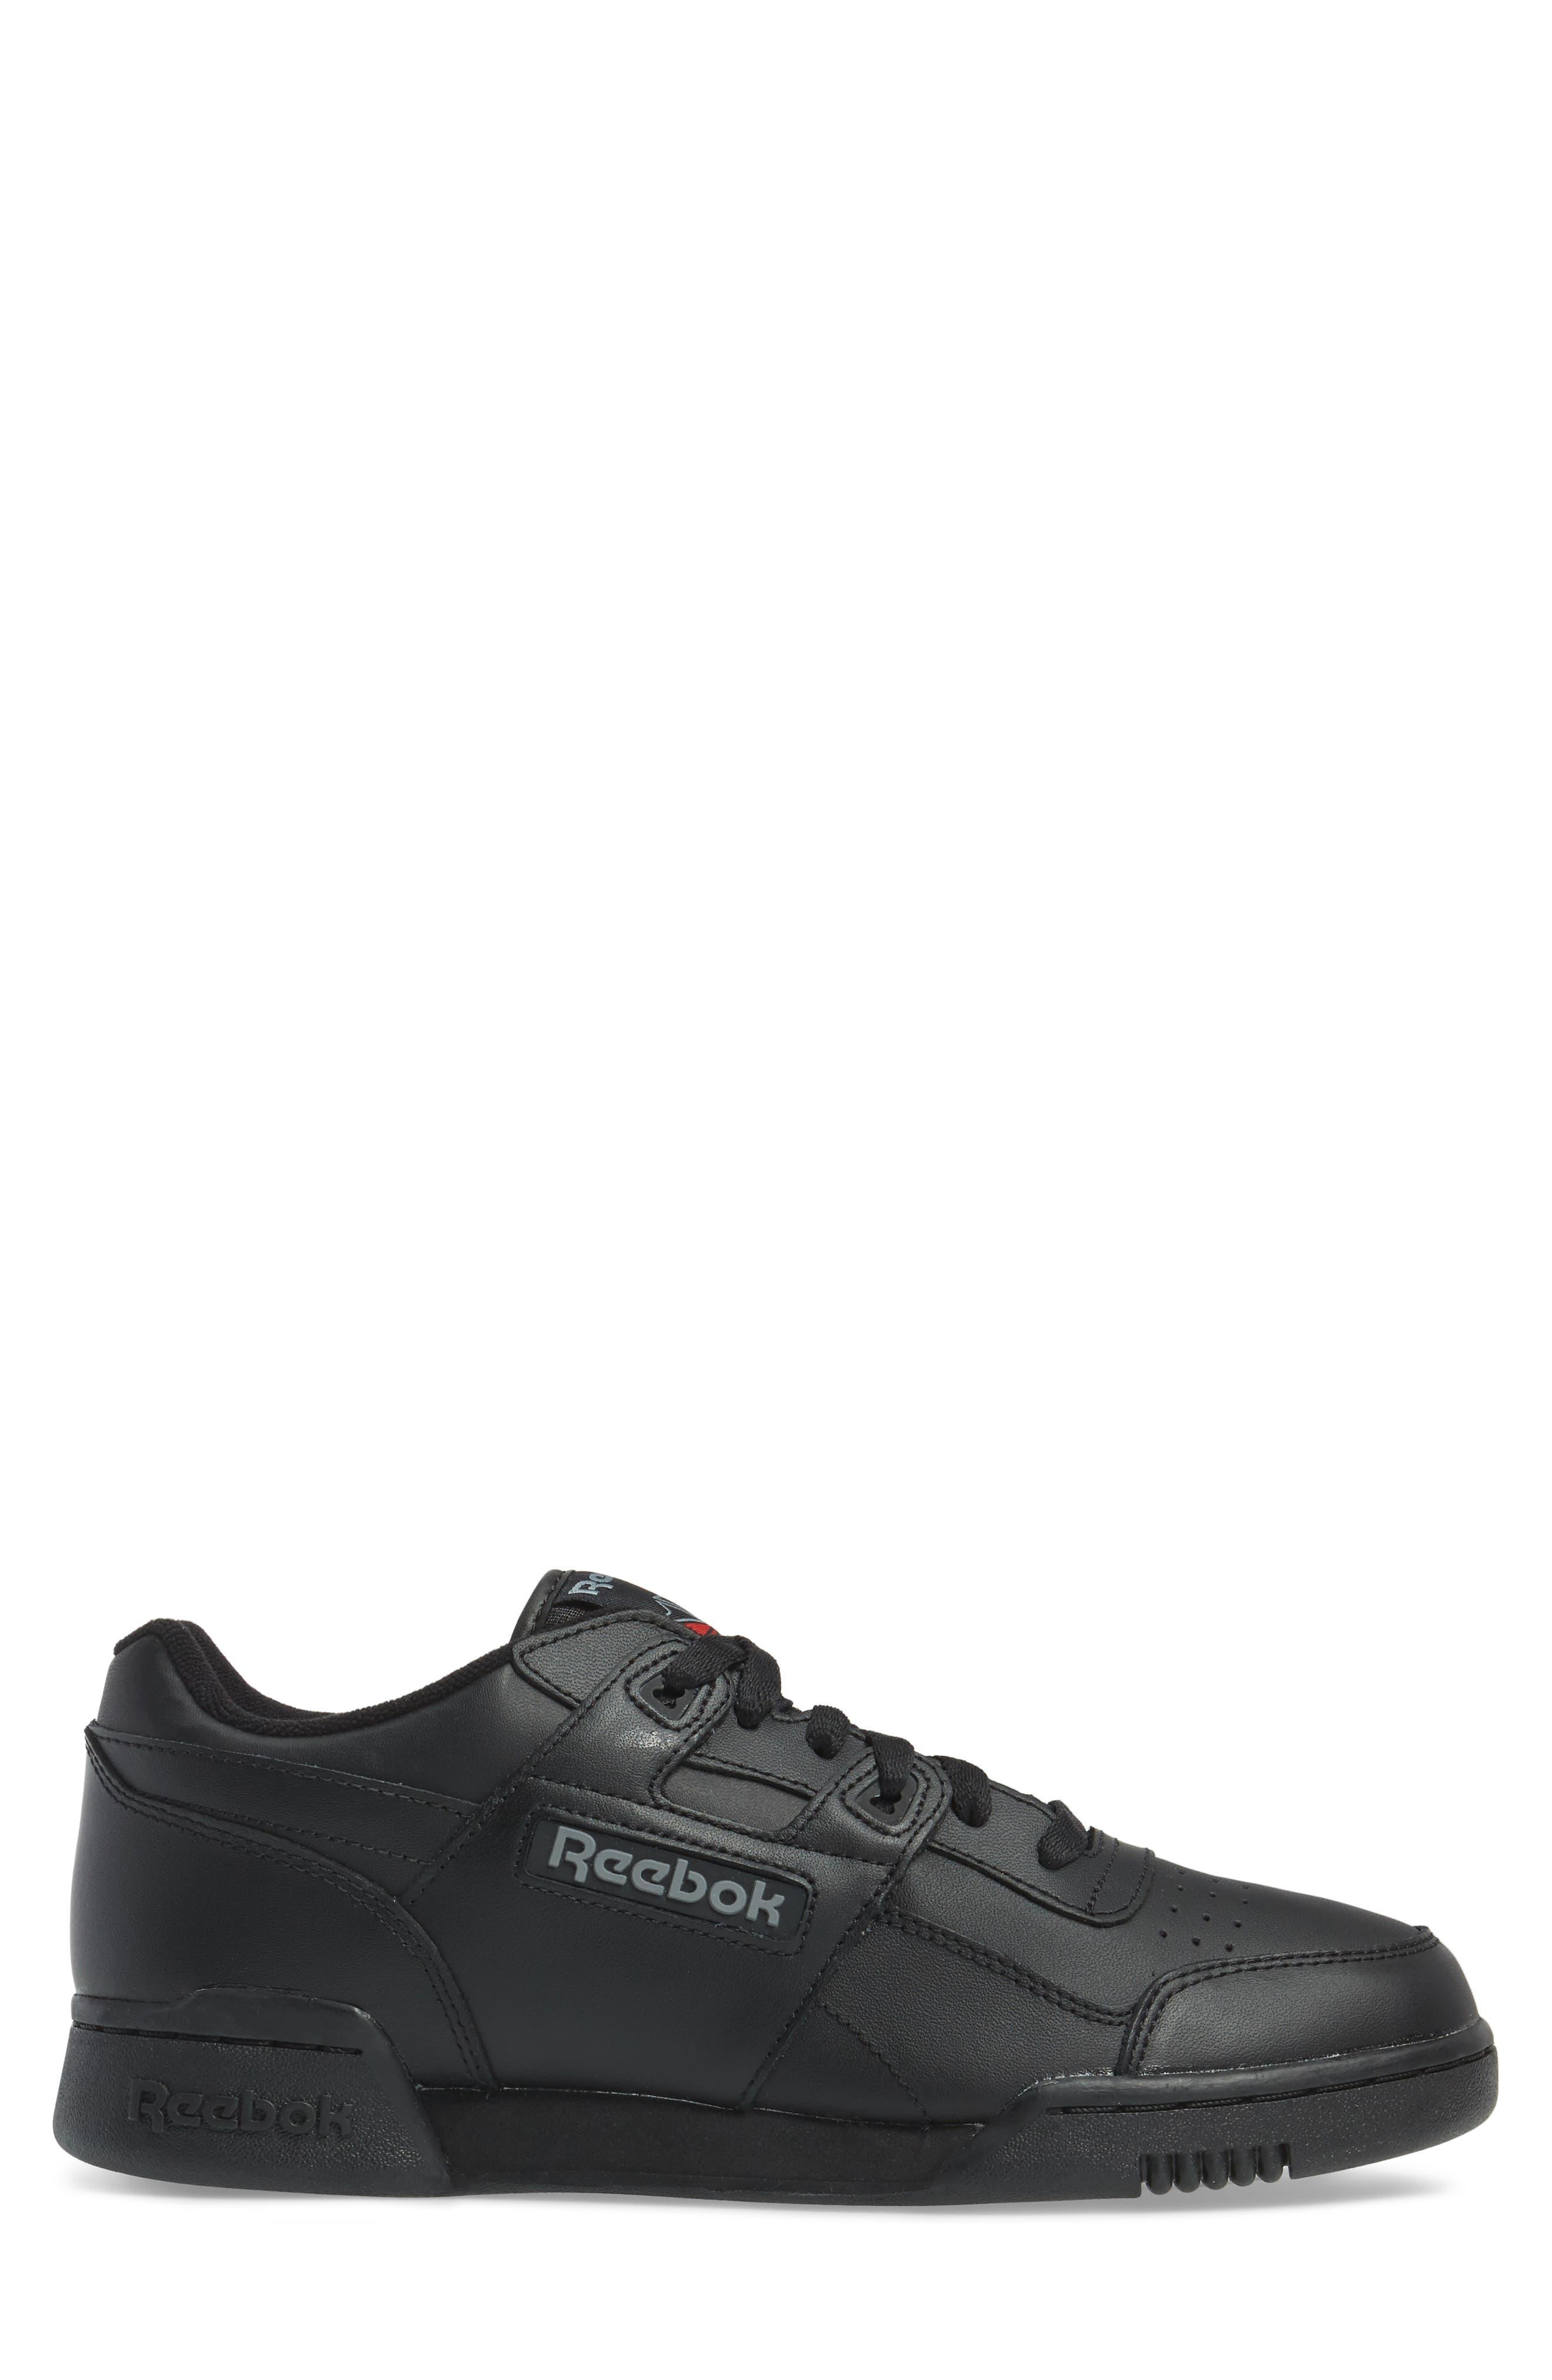 Workout Plus Sneaker,                             Alternate thumbnail 3, color,                             Black/ Charcoal